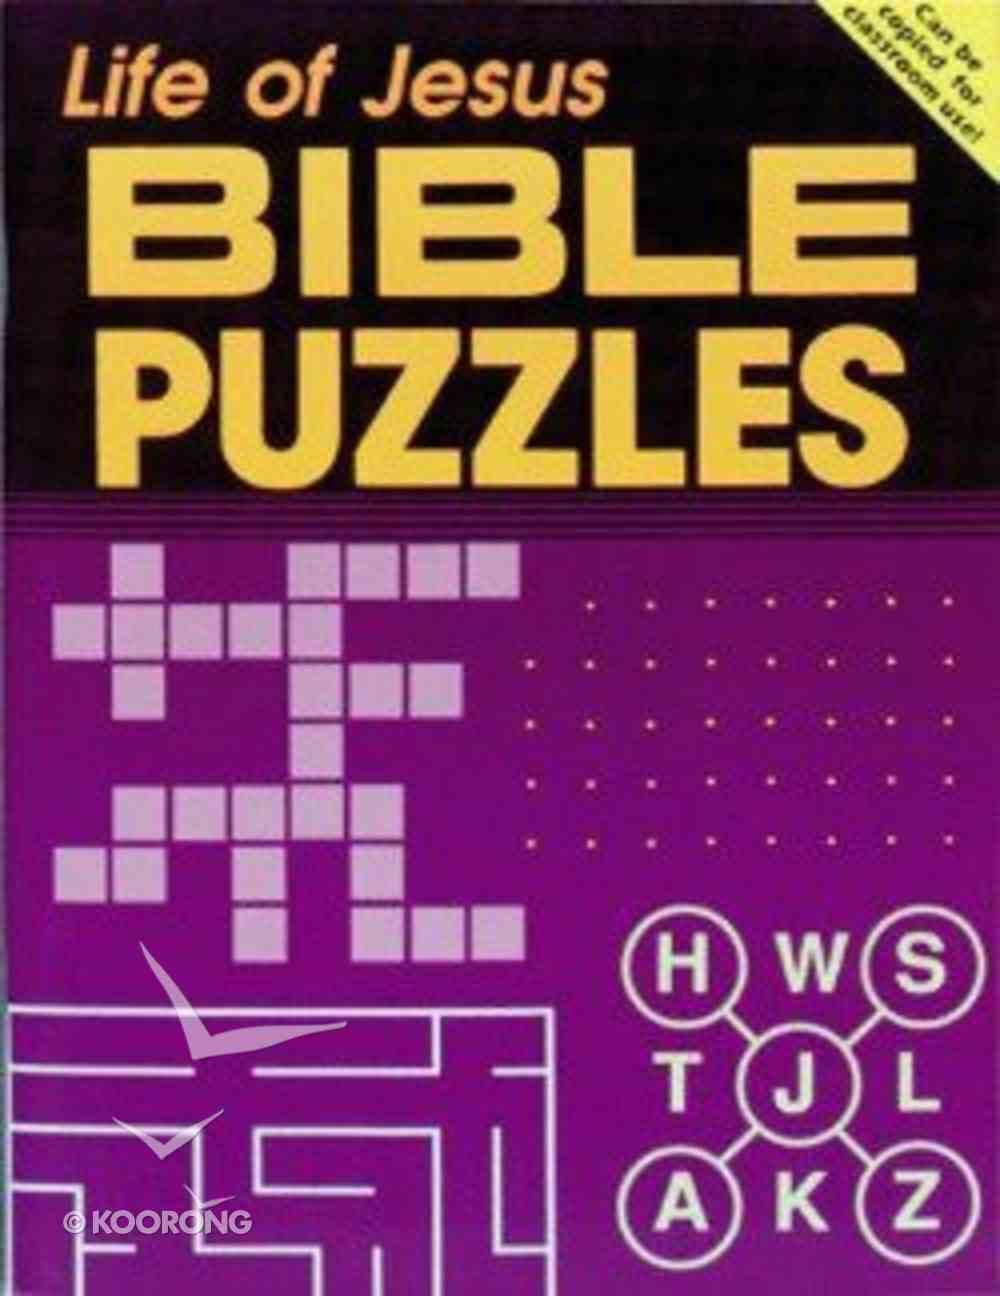 Bible Puzzles: Life of Jesus Paperback